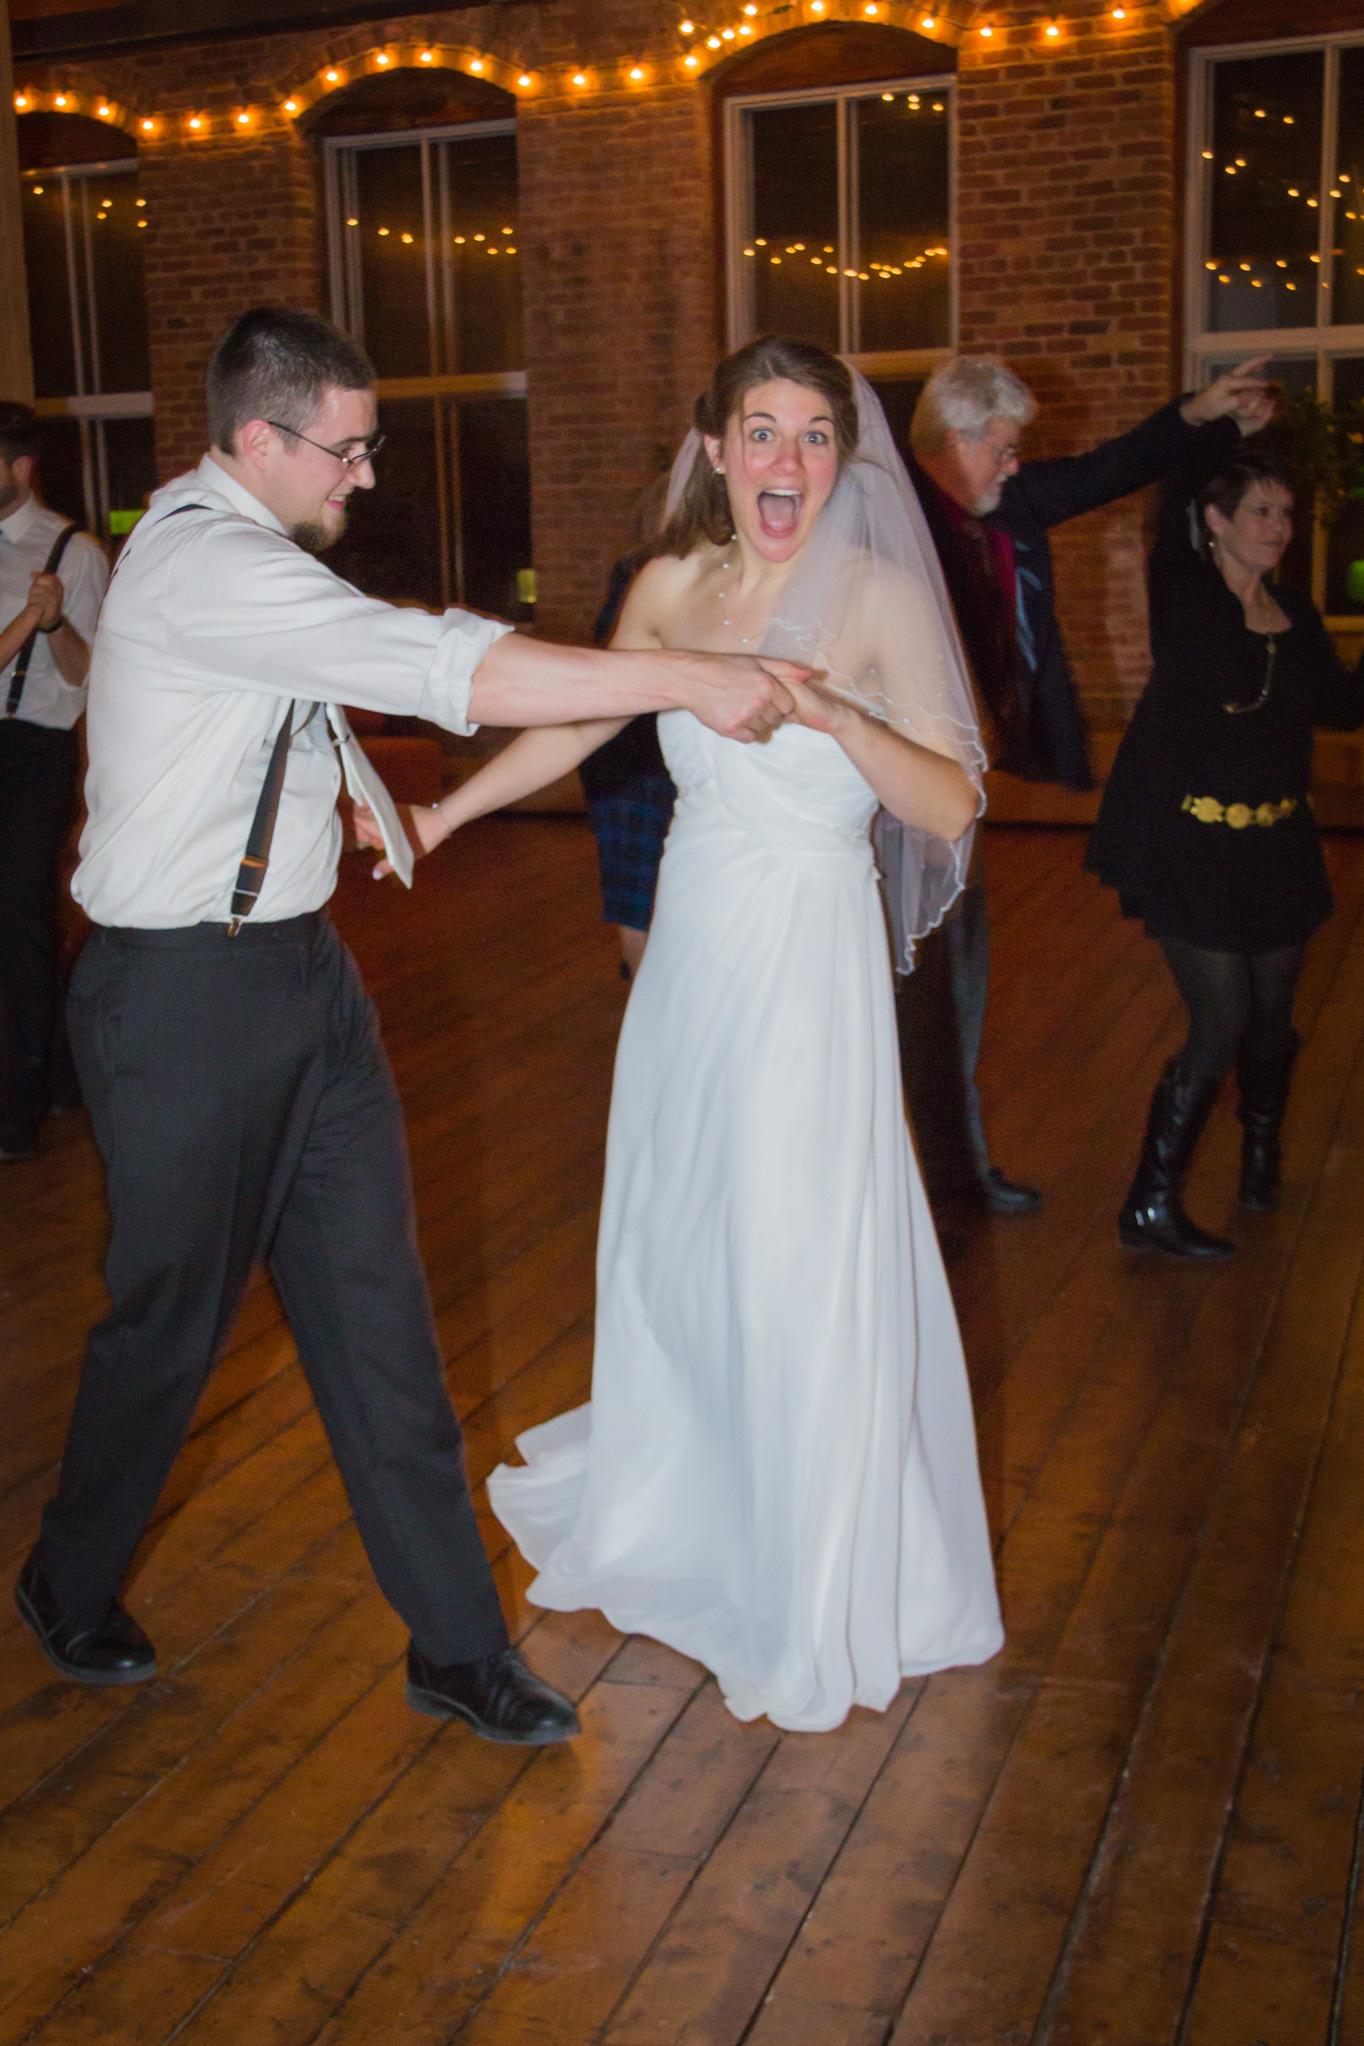 ben_sierra_wedding_dancing_-ring_reception_1.jpg